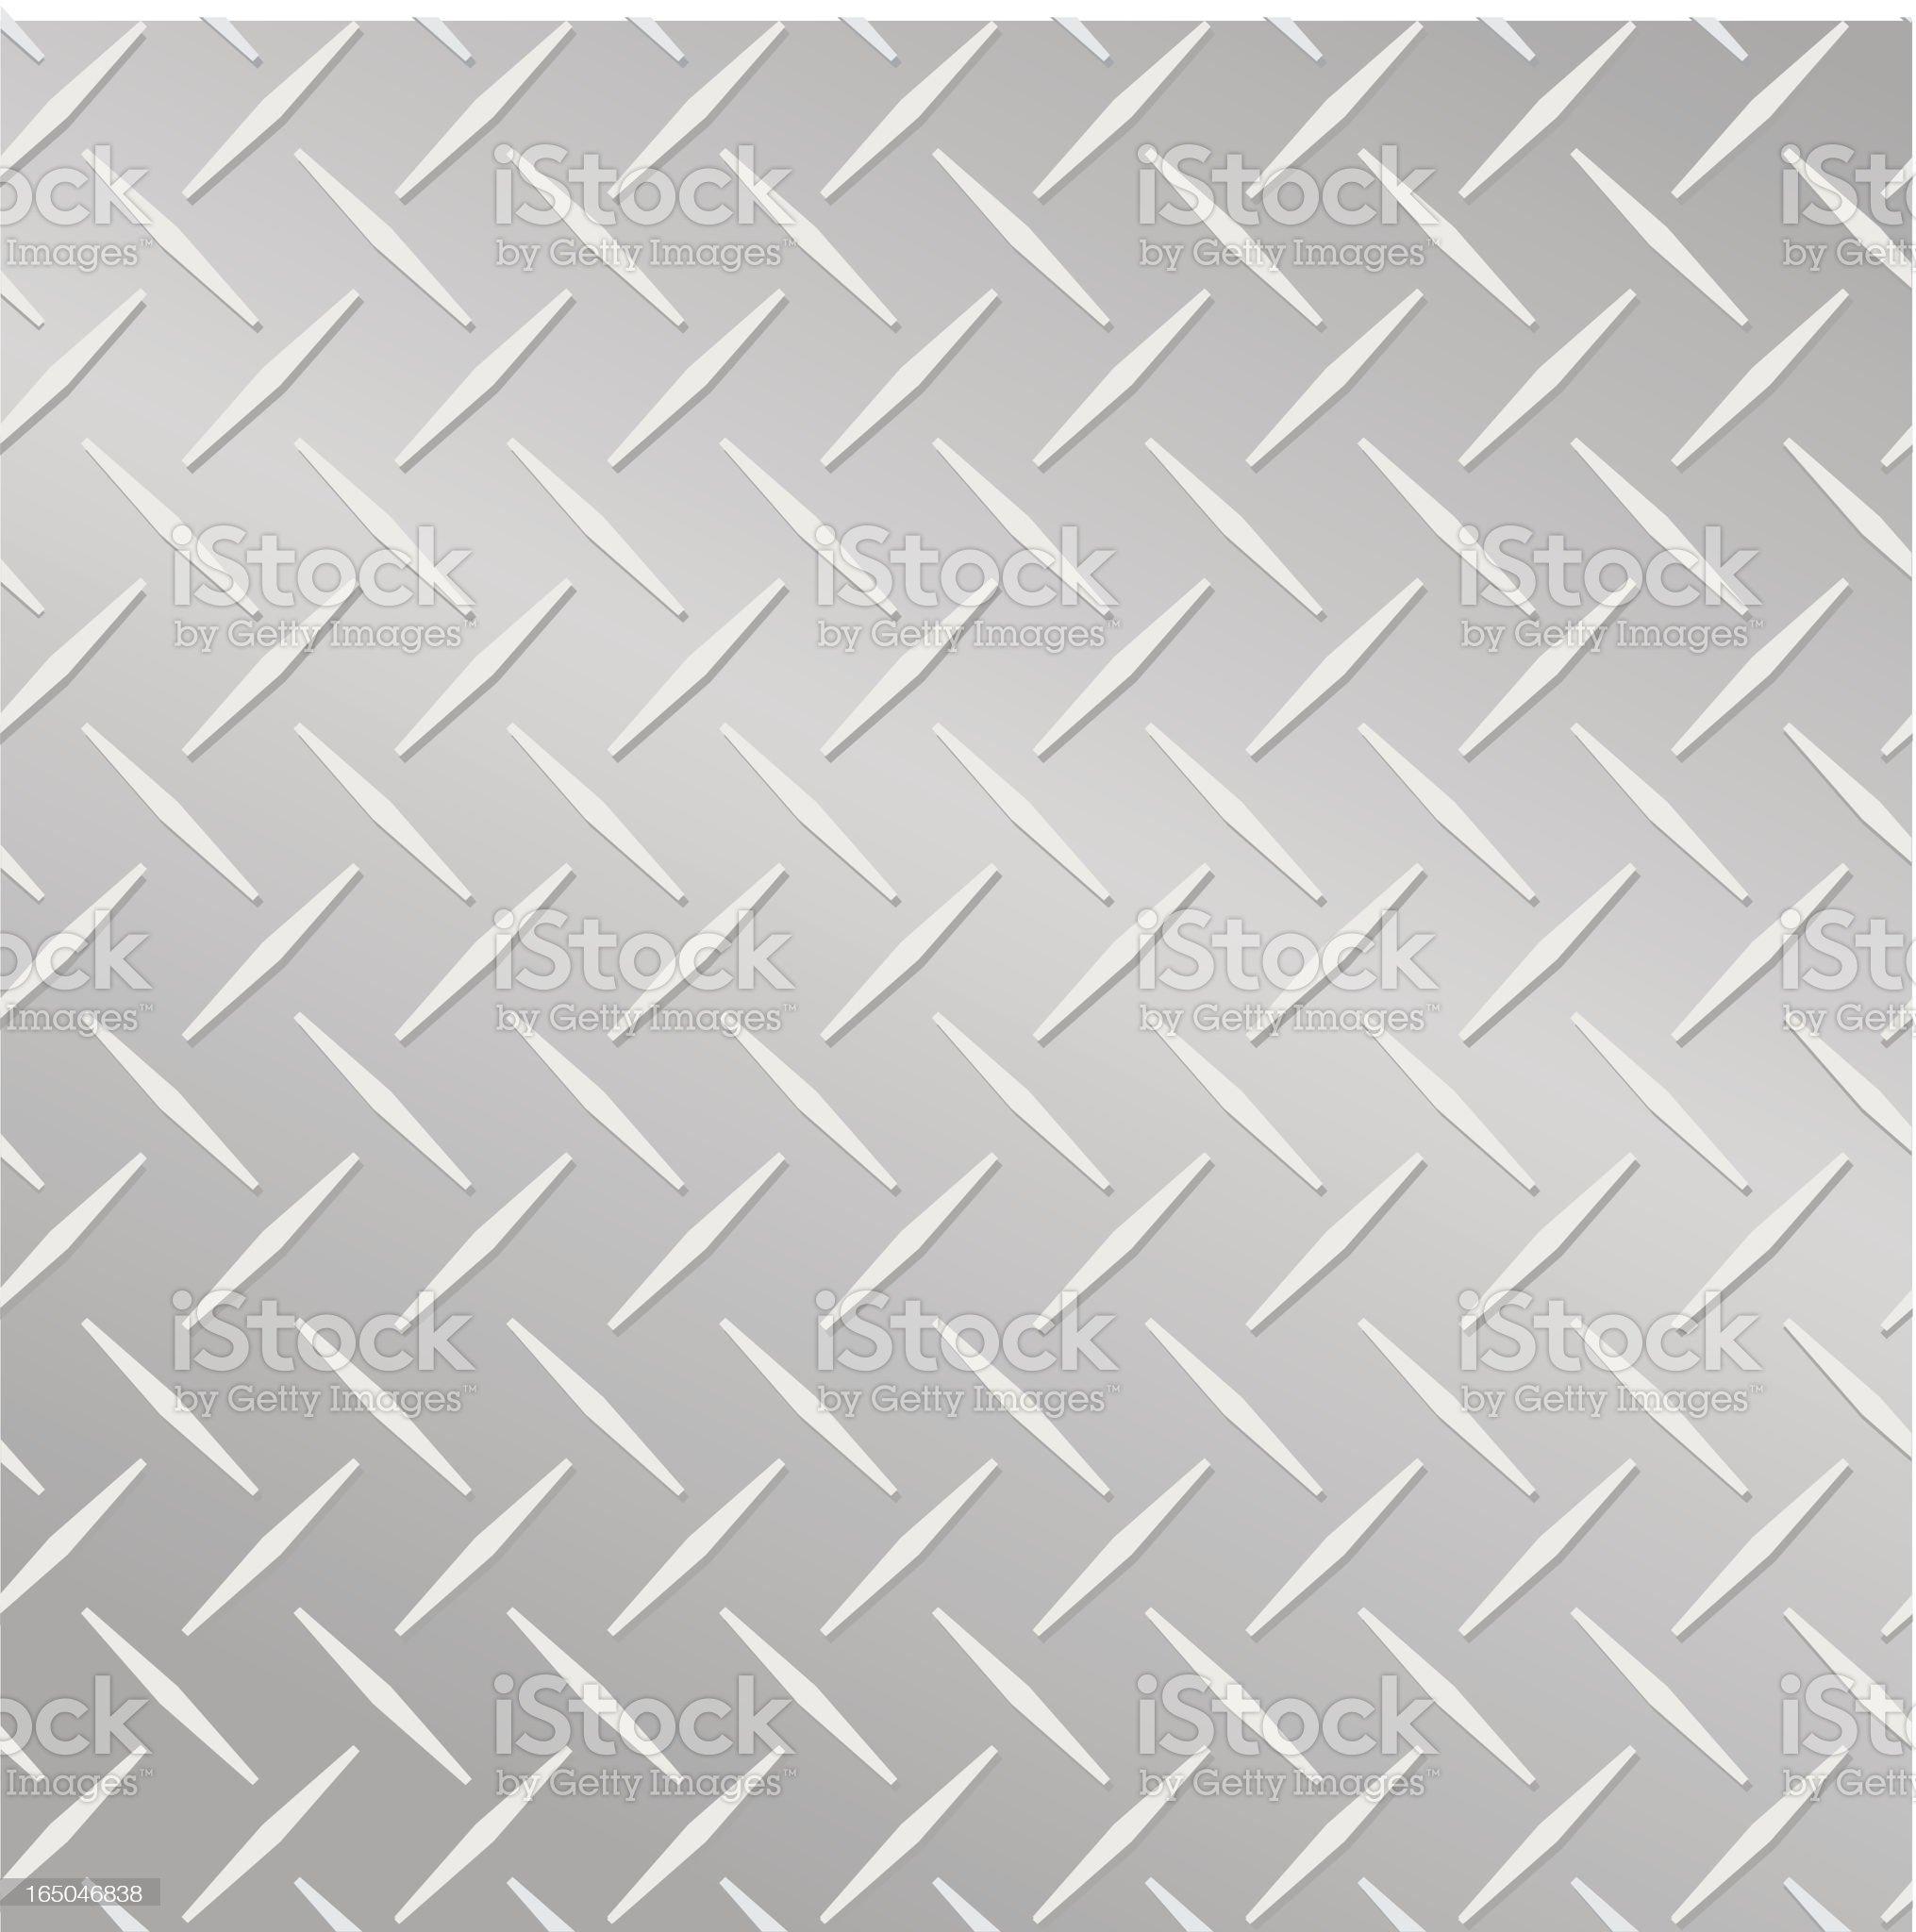 Diamond Metal Plate Illustration royalty-free stock vector art